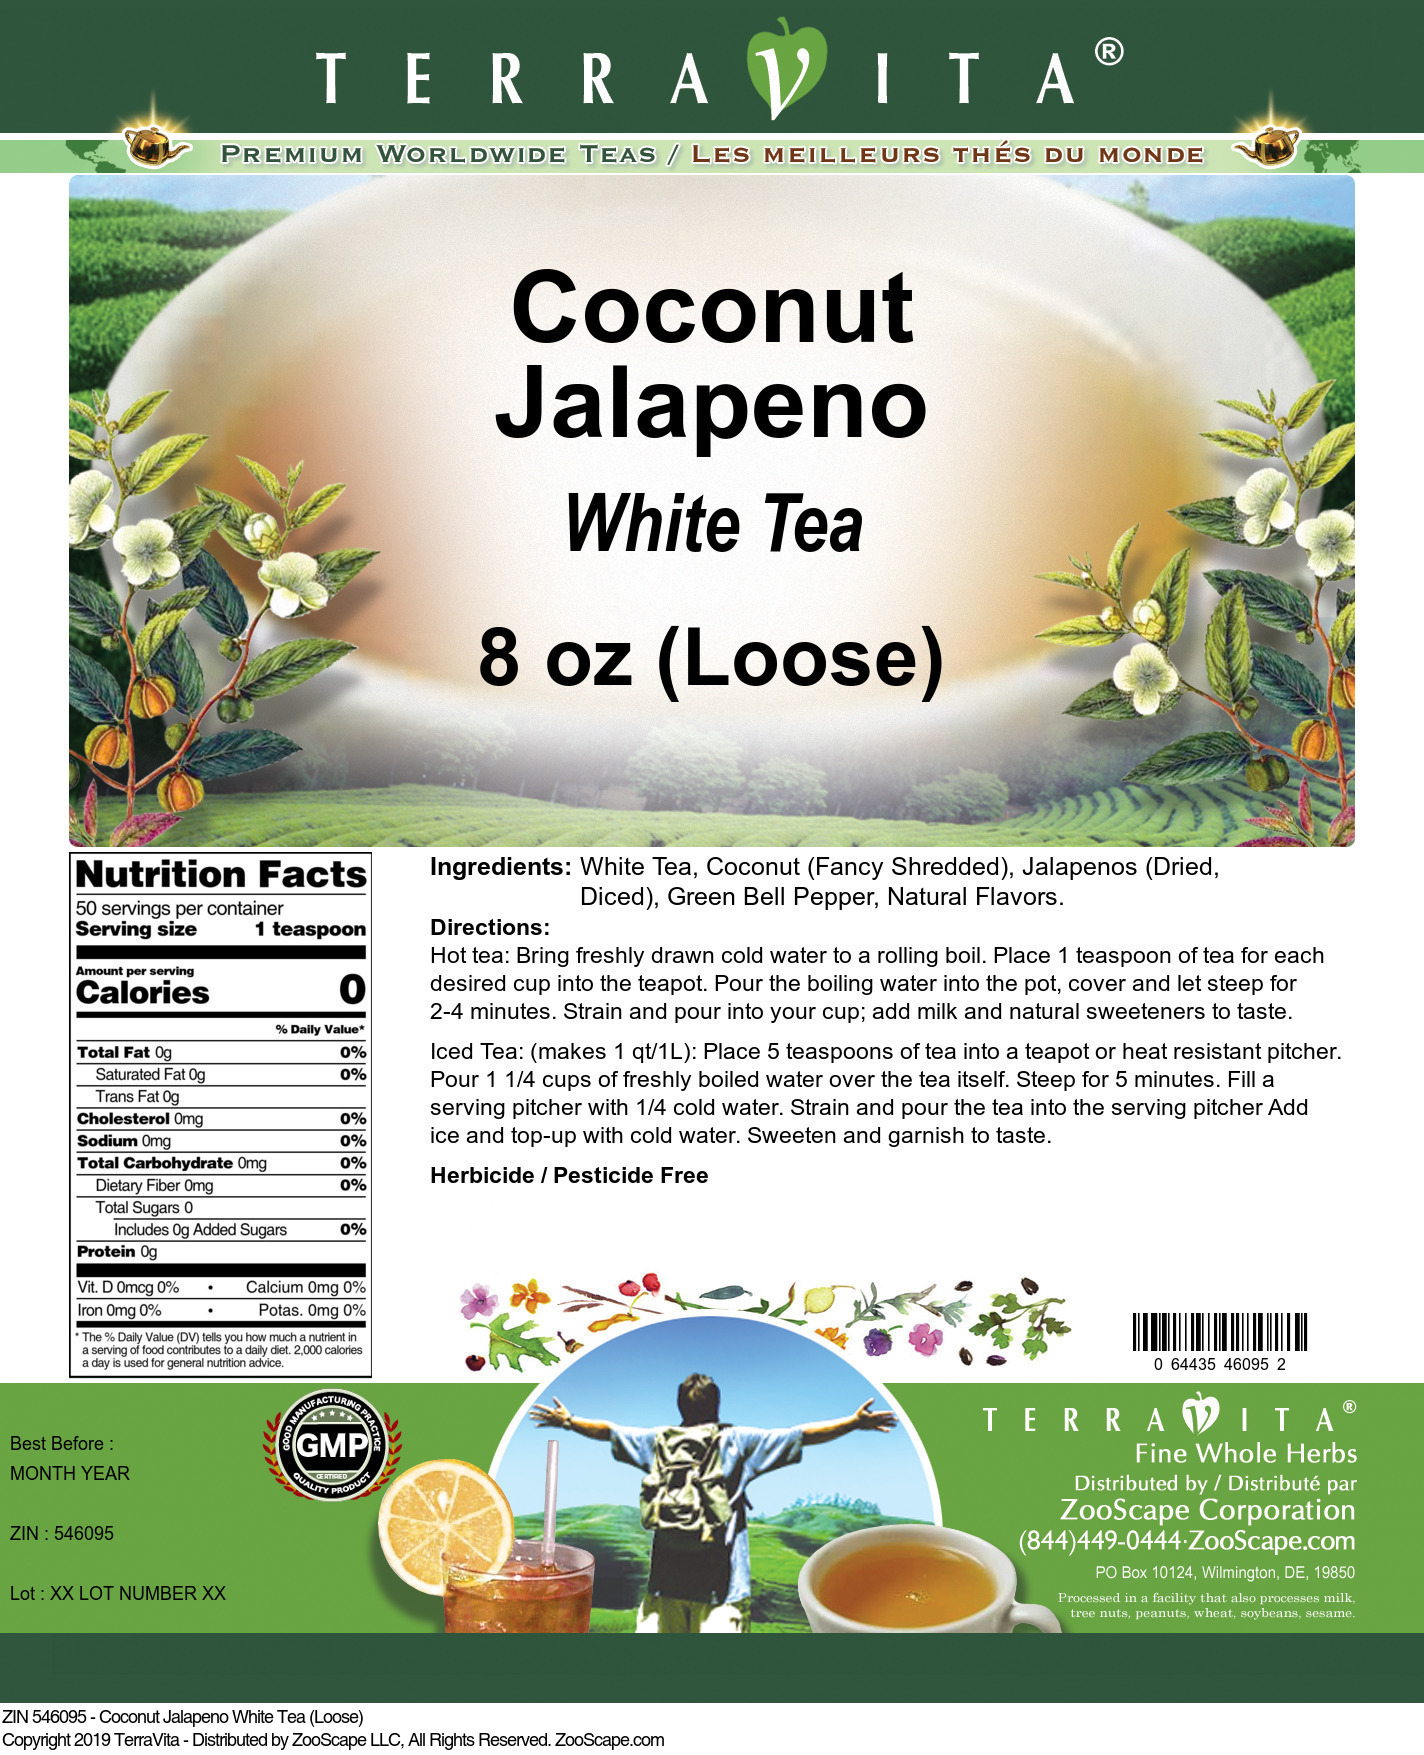 Coconut Jalapeno White Tea